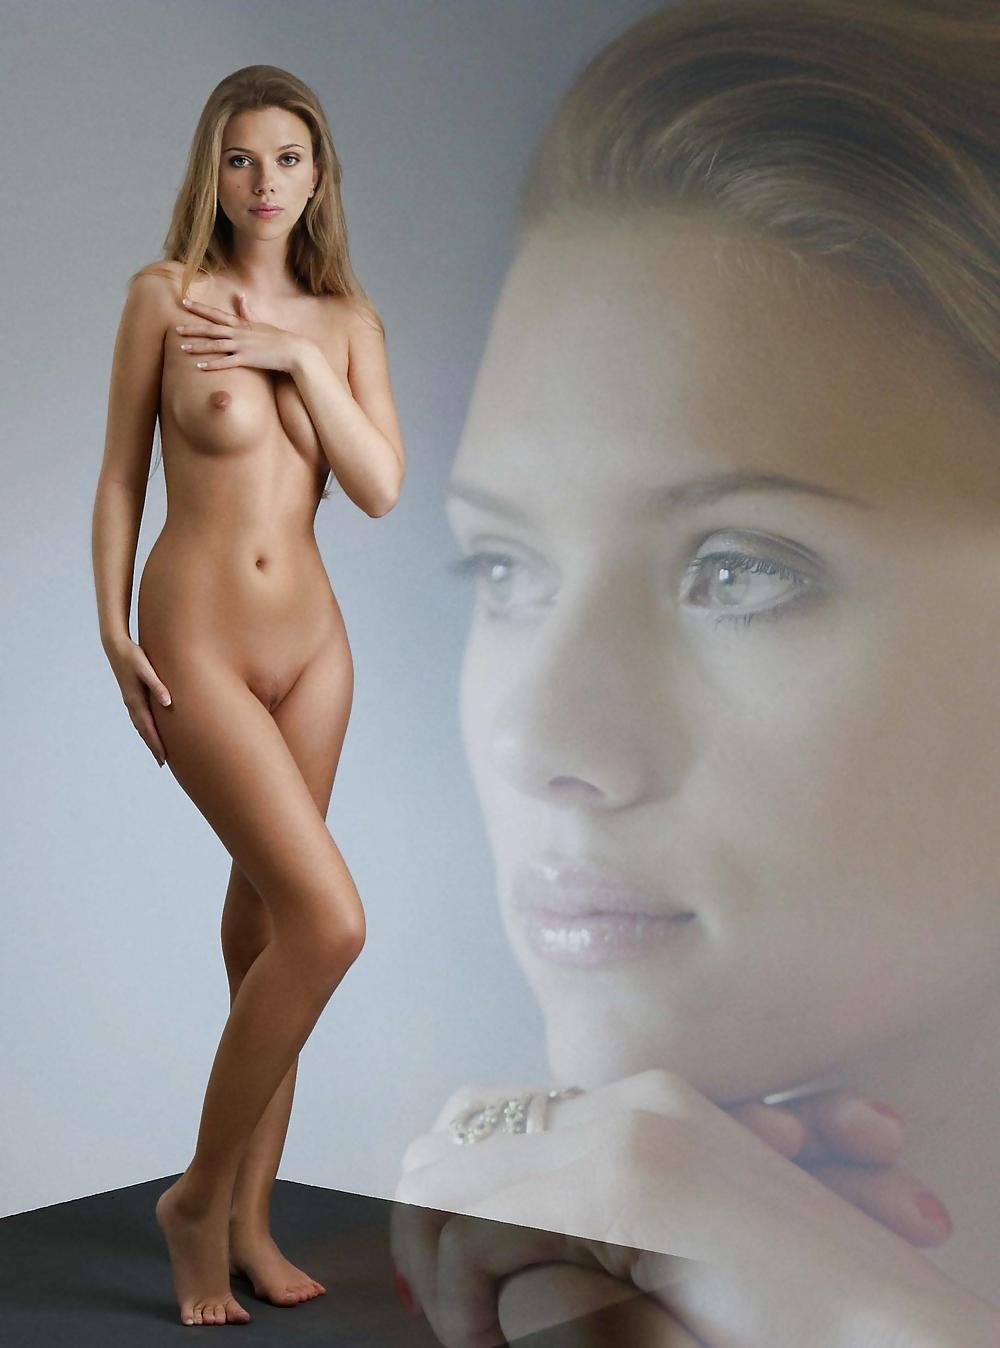 Scarlett johansson erotic photos of celebrities and sexy actresses